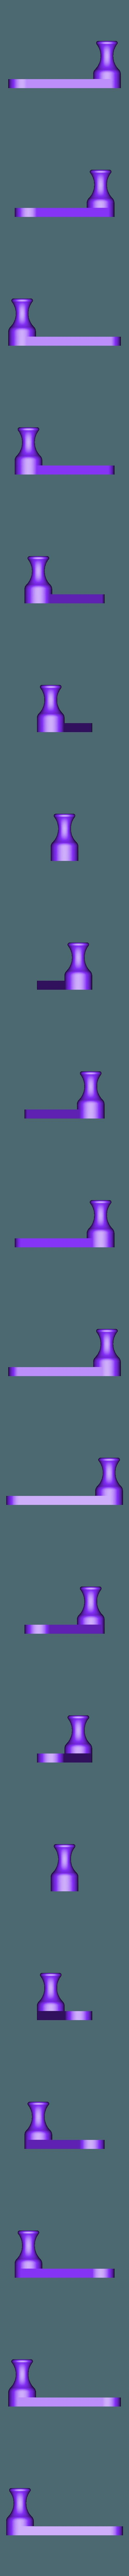 Arm_gb_v2.stl Download free STL file Car Vent Gravity Phone Holder • 3D printable template, jurekkb